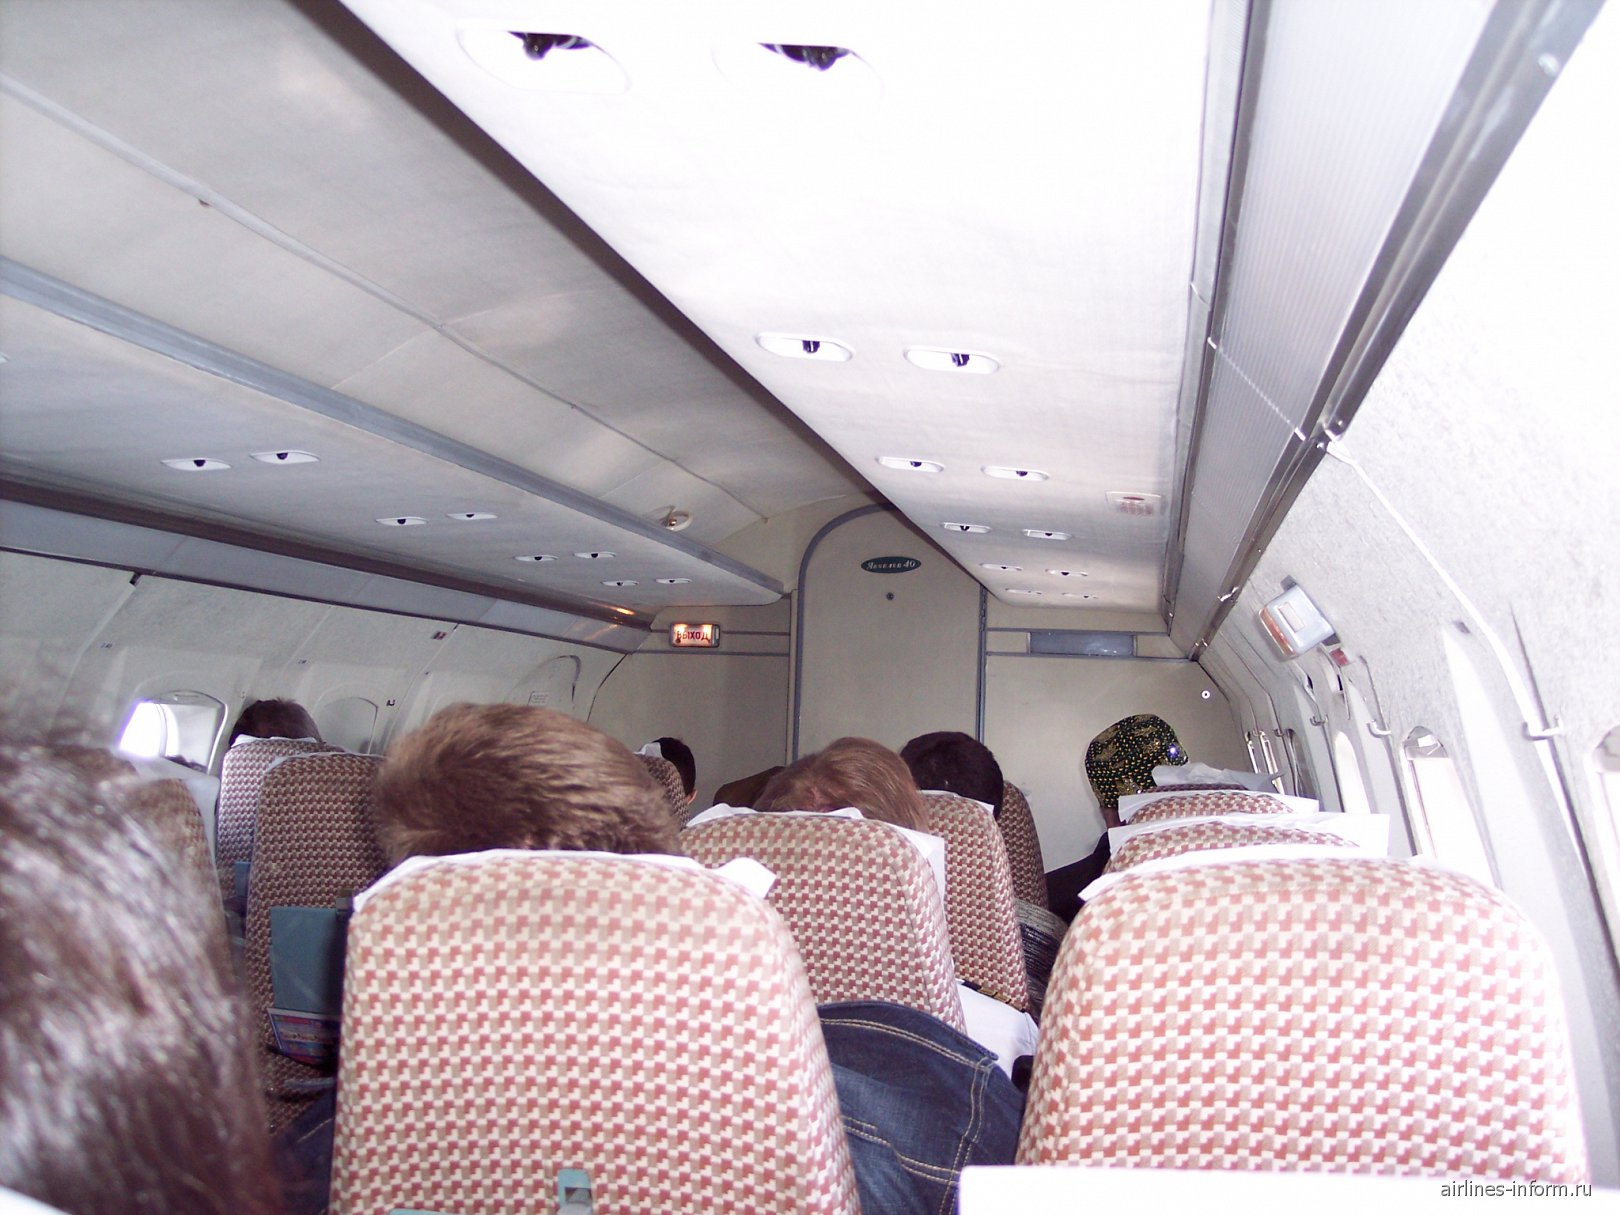 Салон самолета Як-40 Бугульминского авиапредприятия